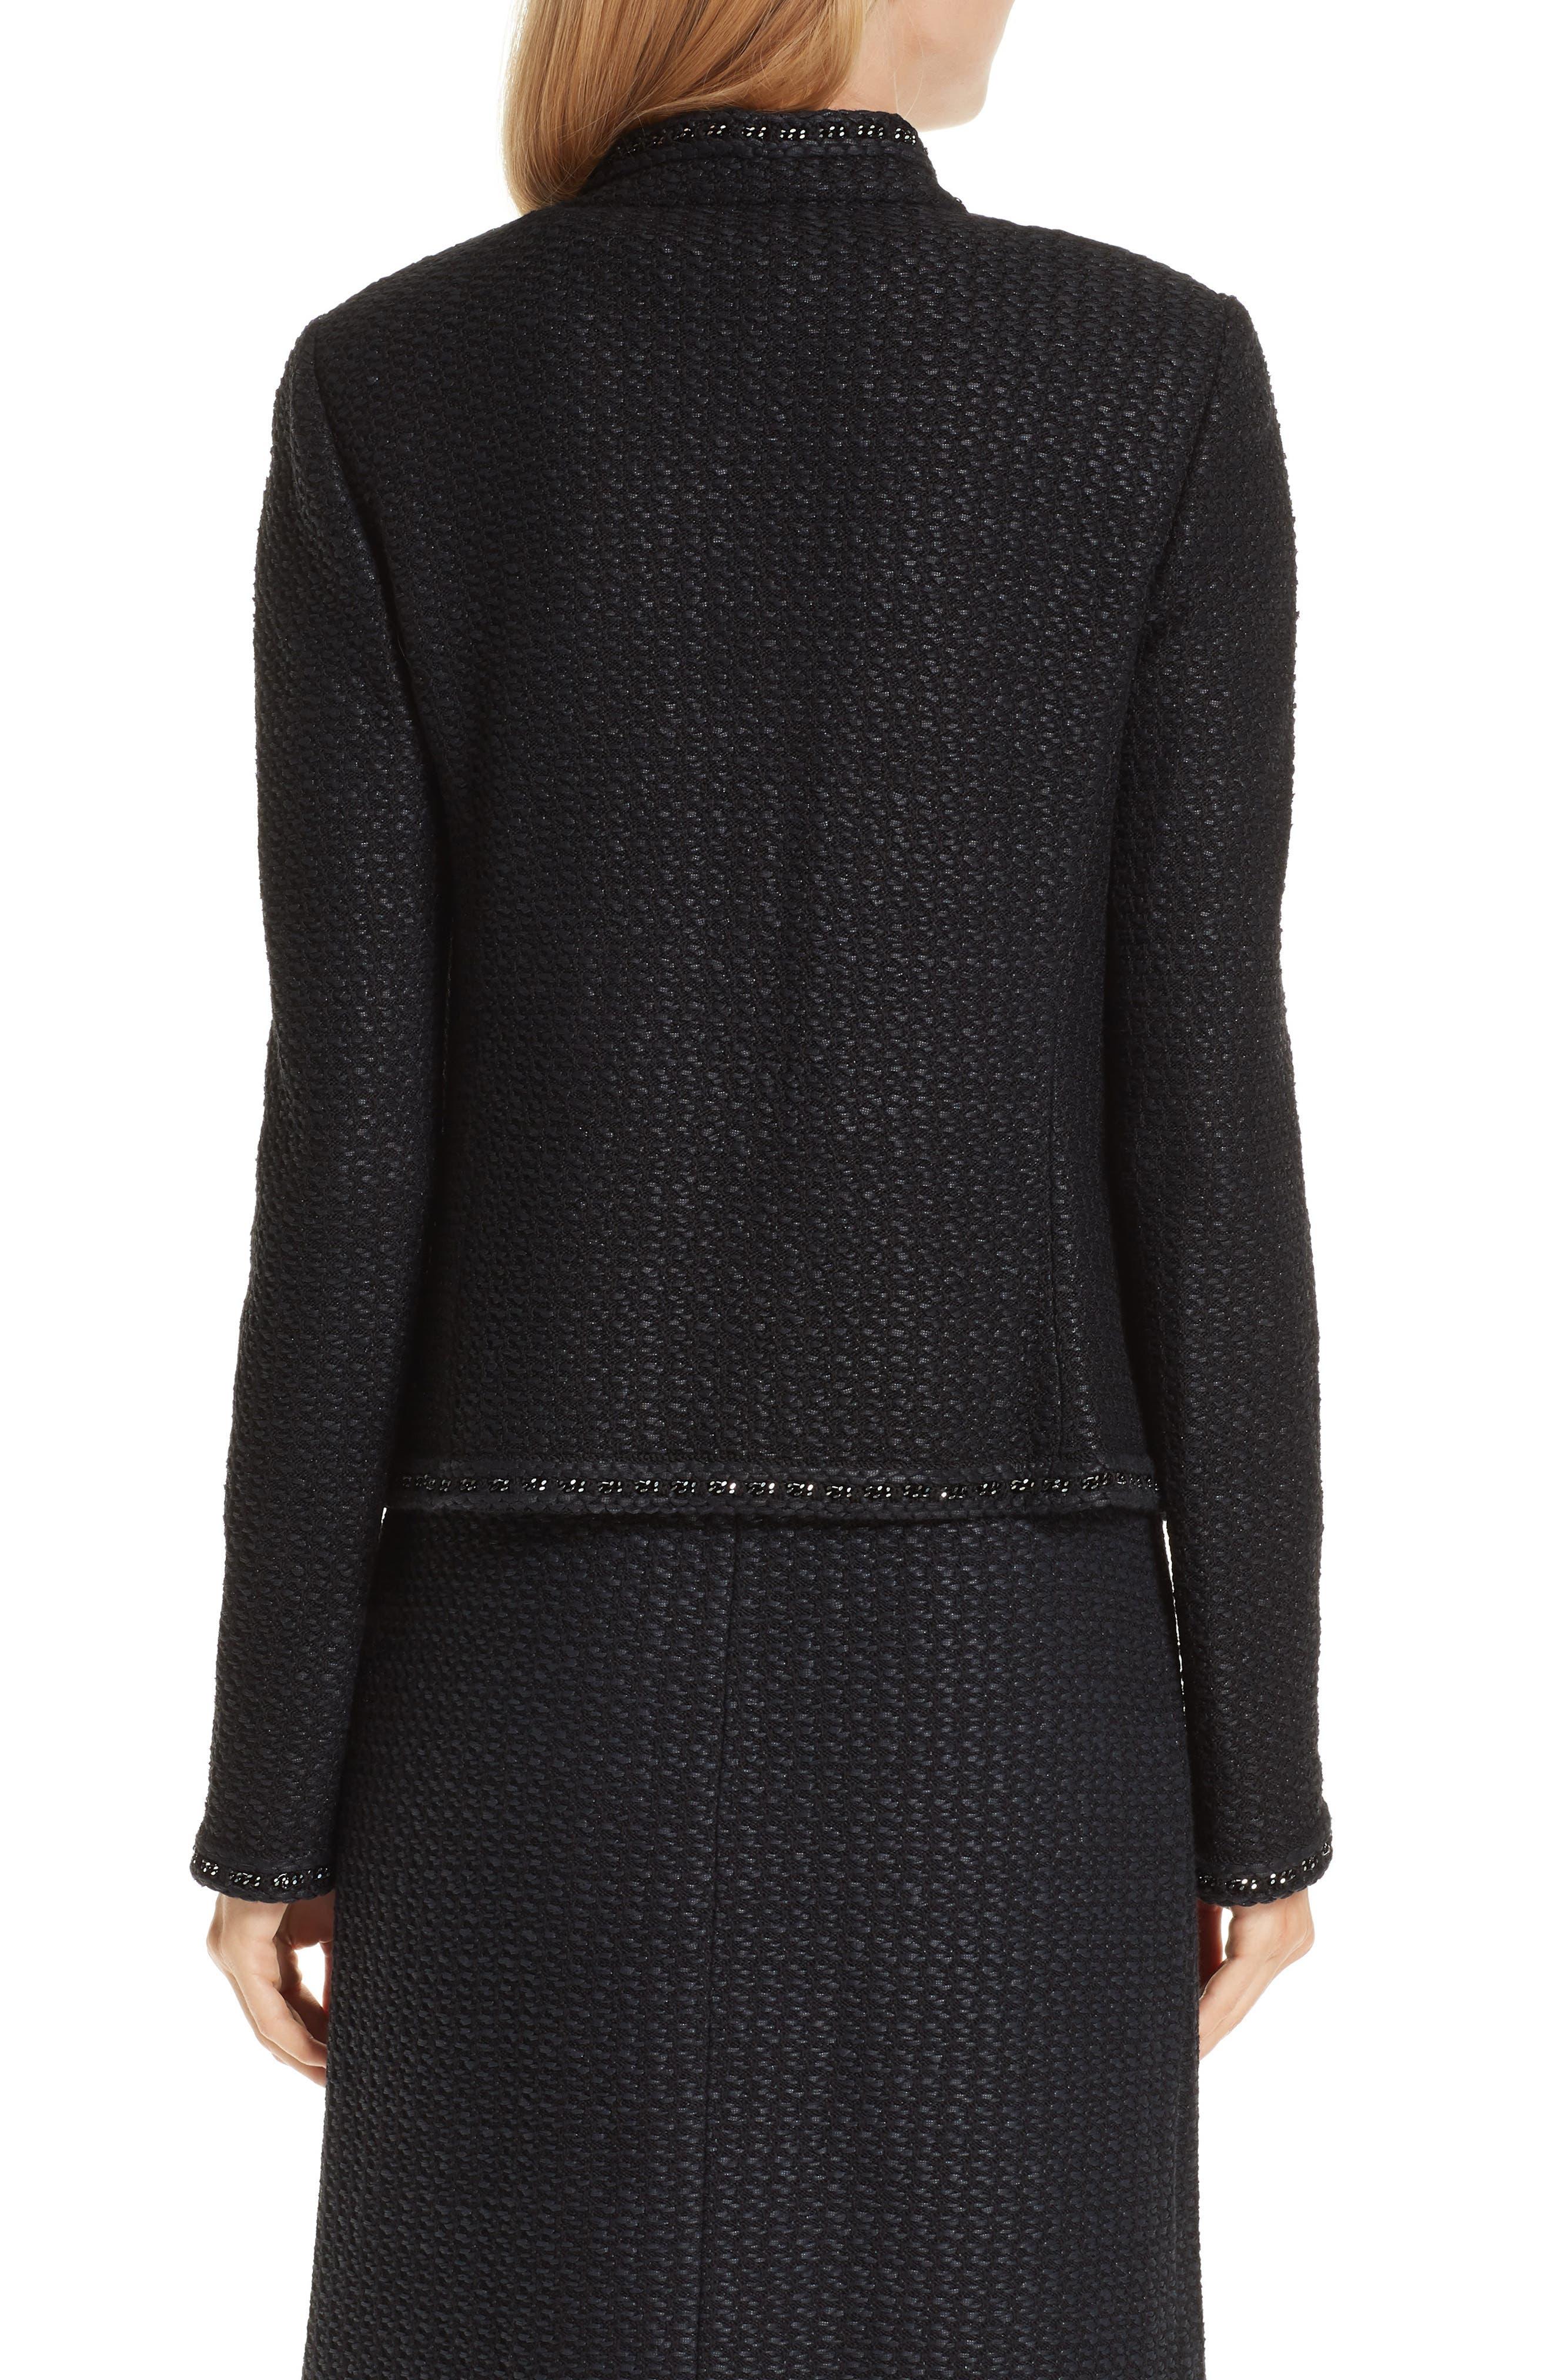 Adina Knit Short Jacket,                             Alternate thumbnail 2, color,                             CAVIAR